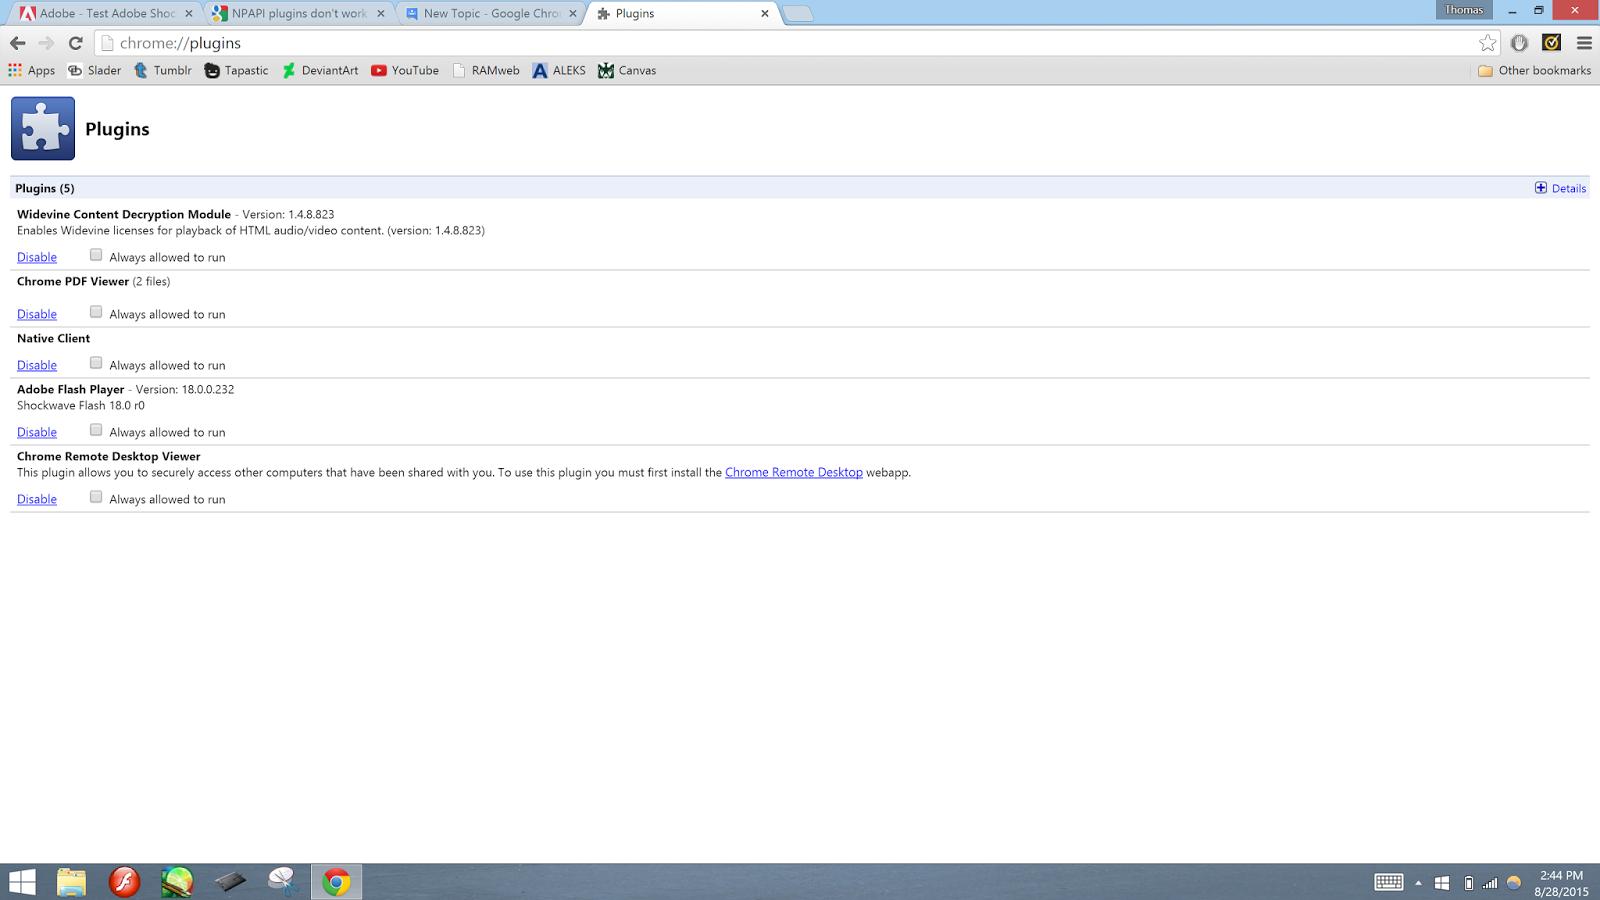 Adobe Shockwave player won't install into Google Chrome! - Google